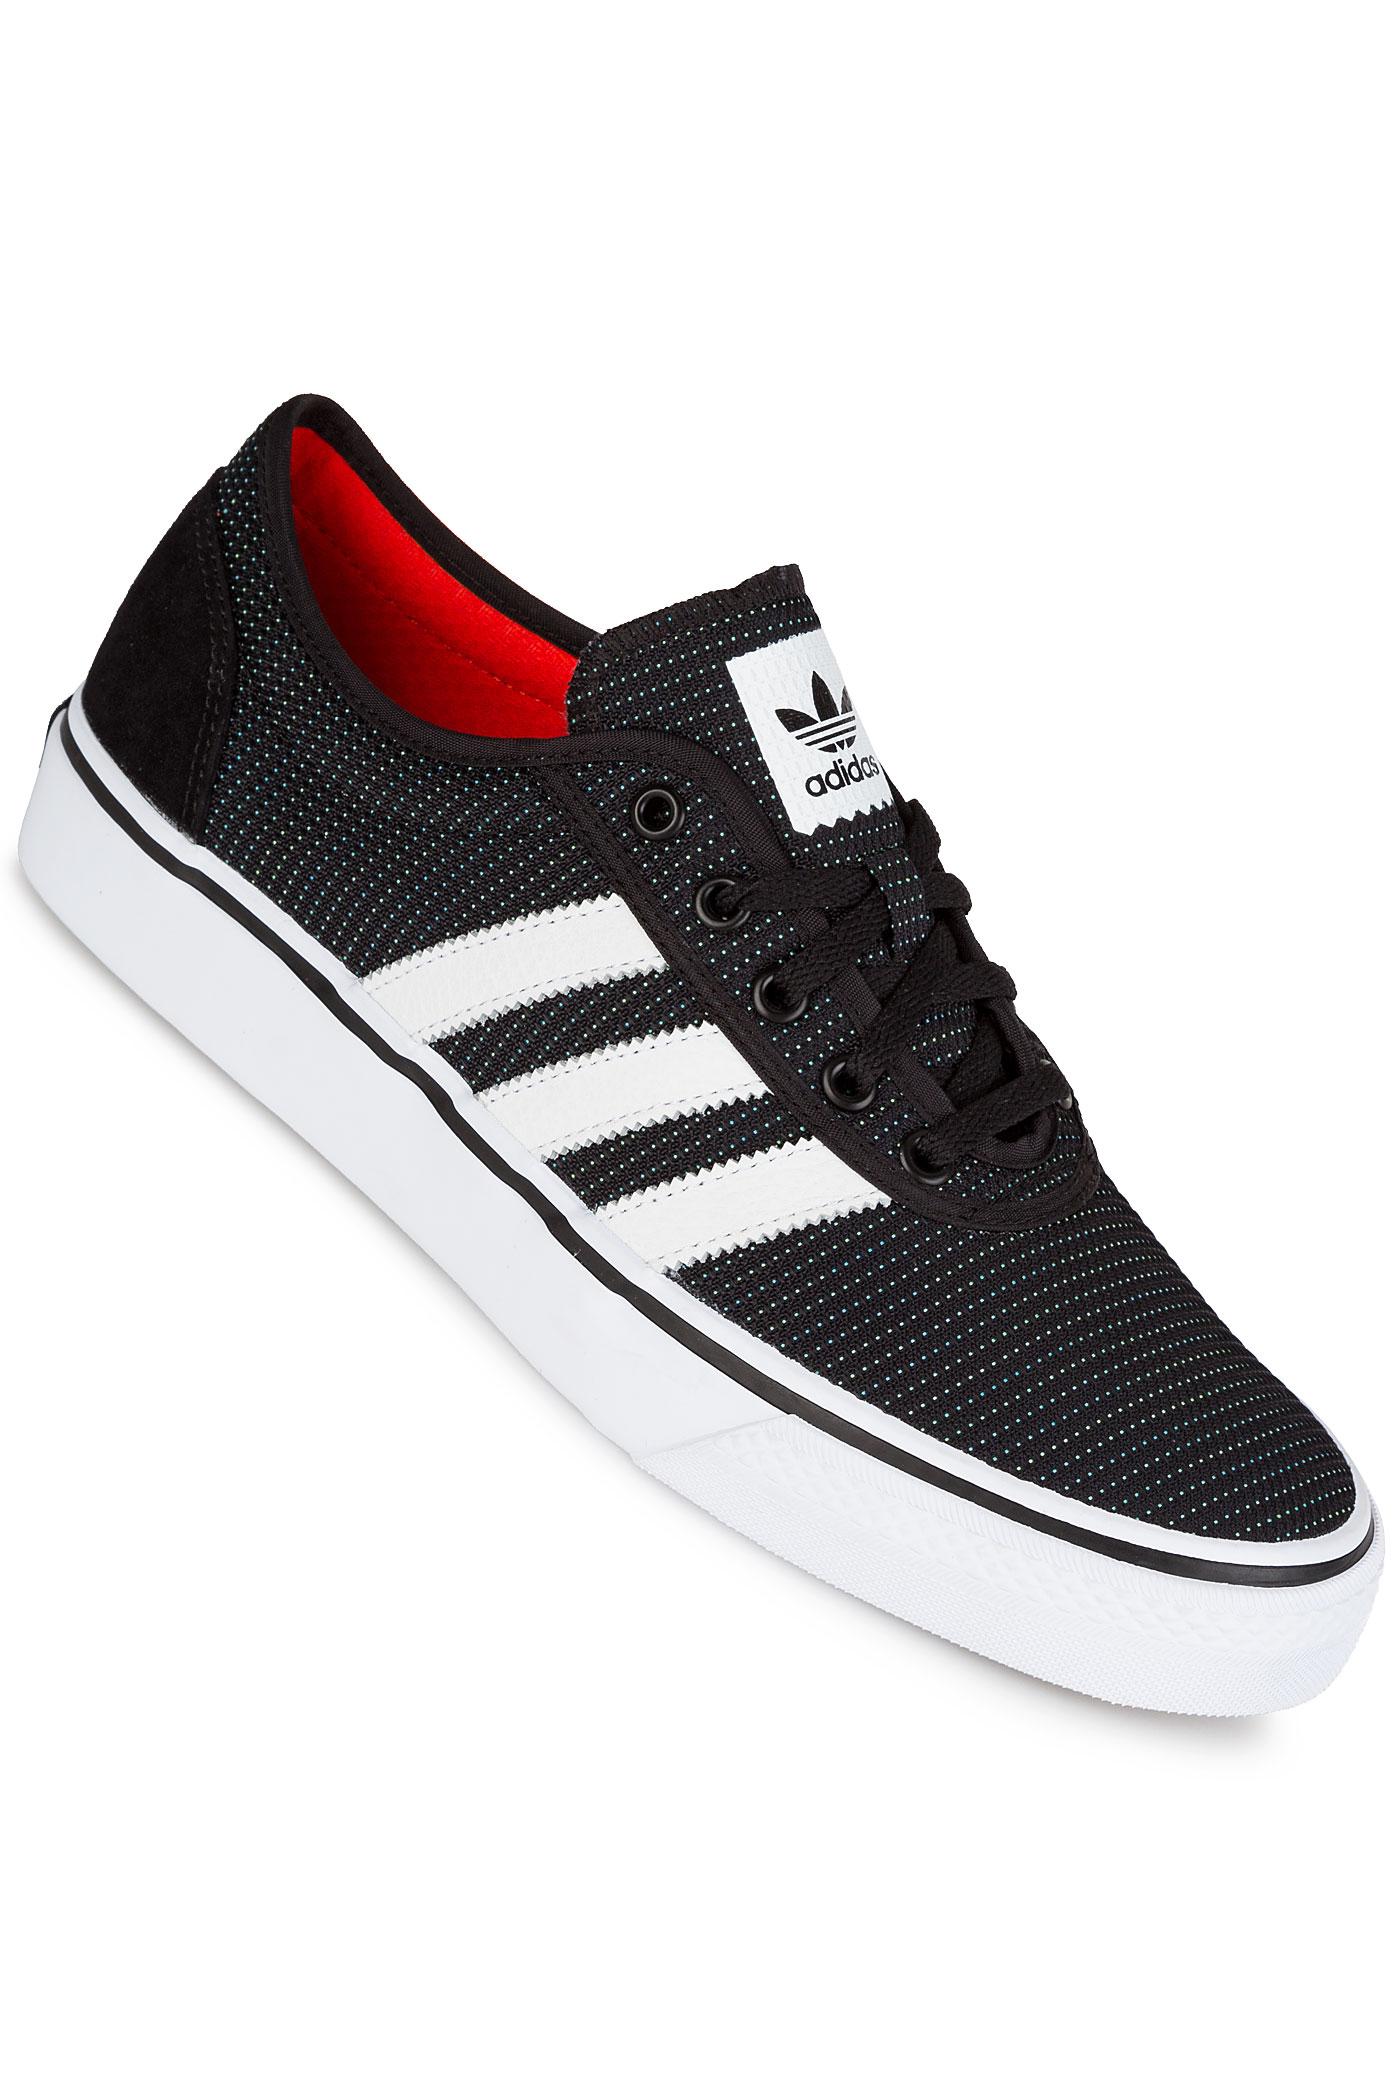 Adidas Adi Ease Shoe Review